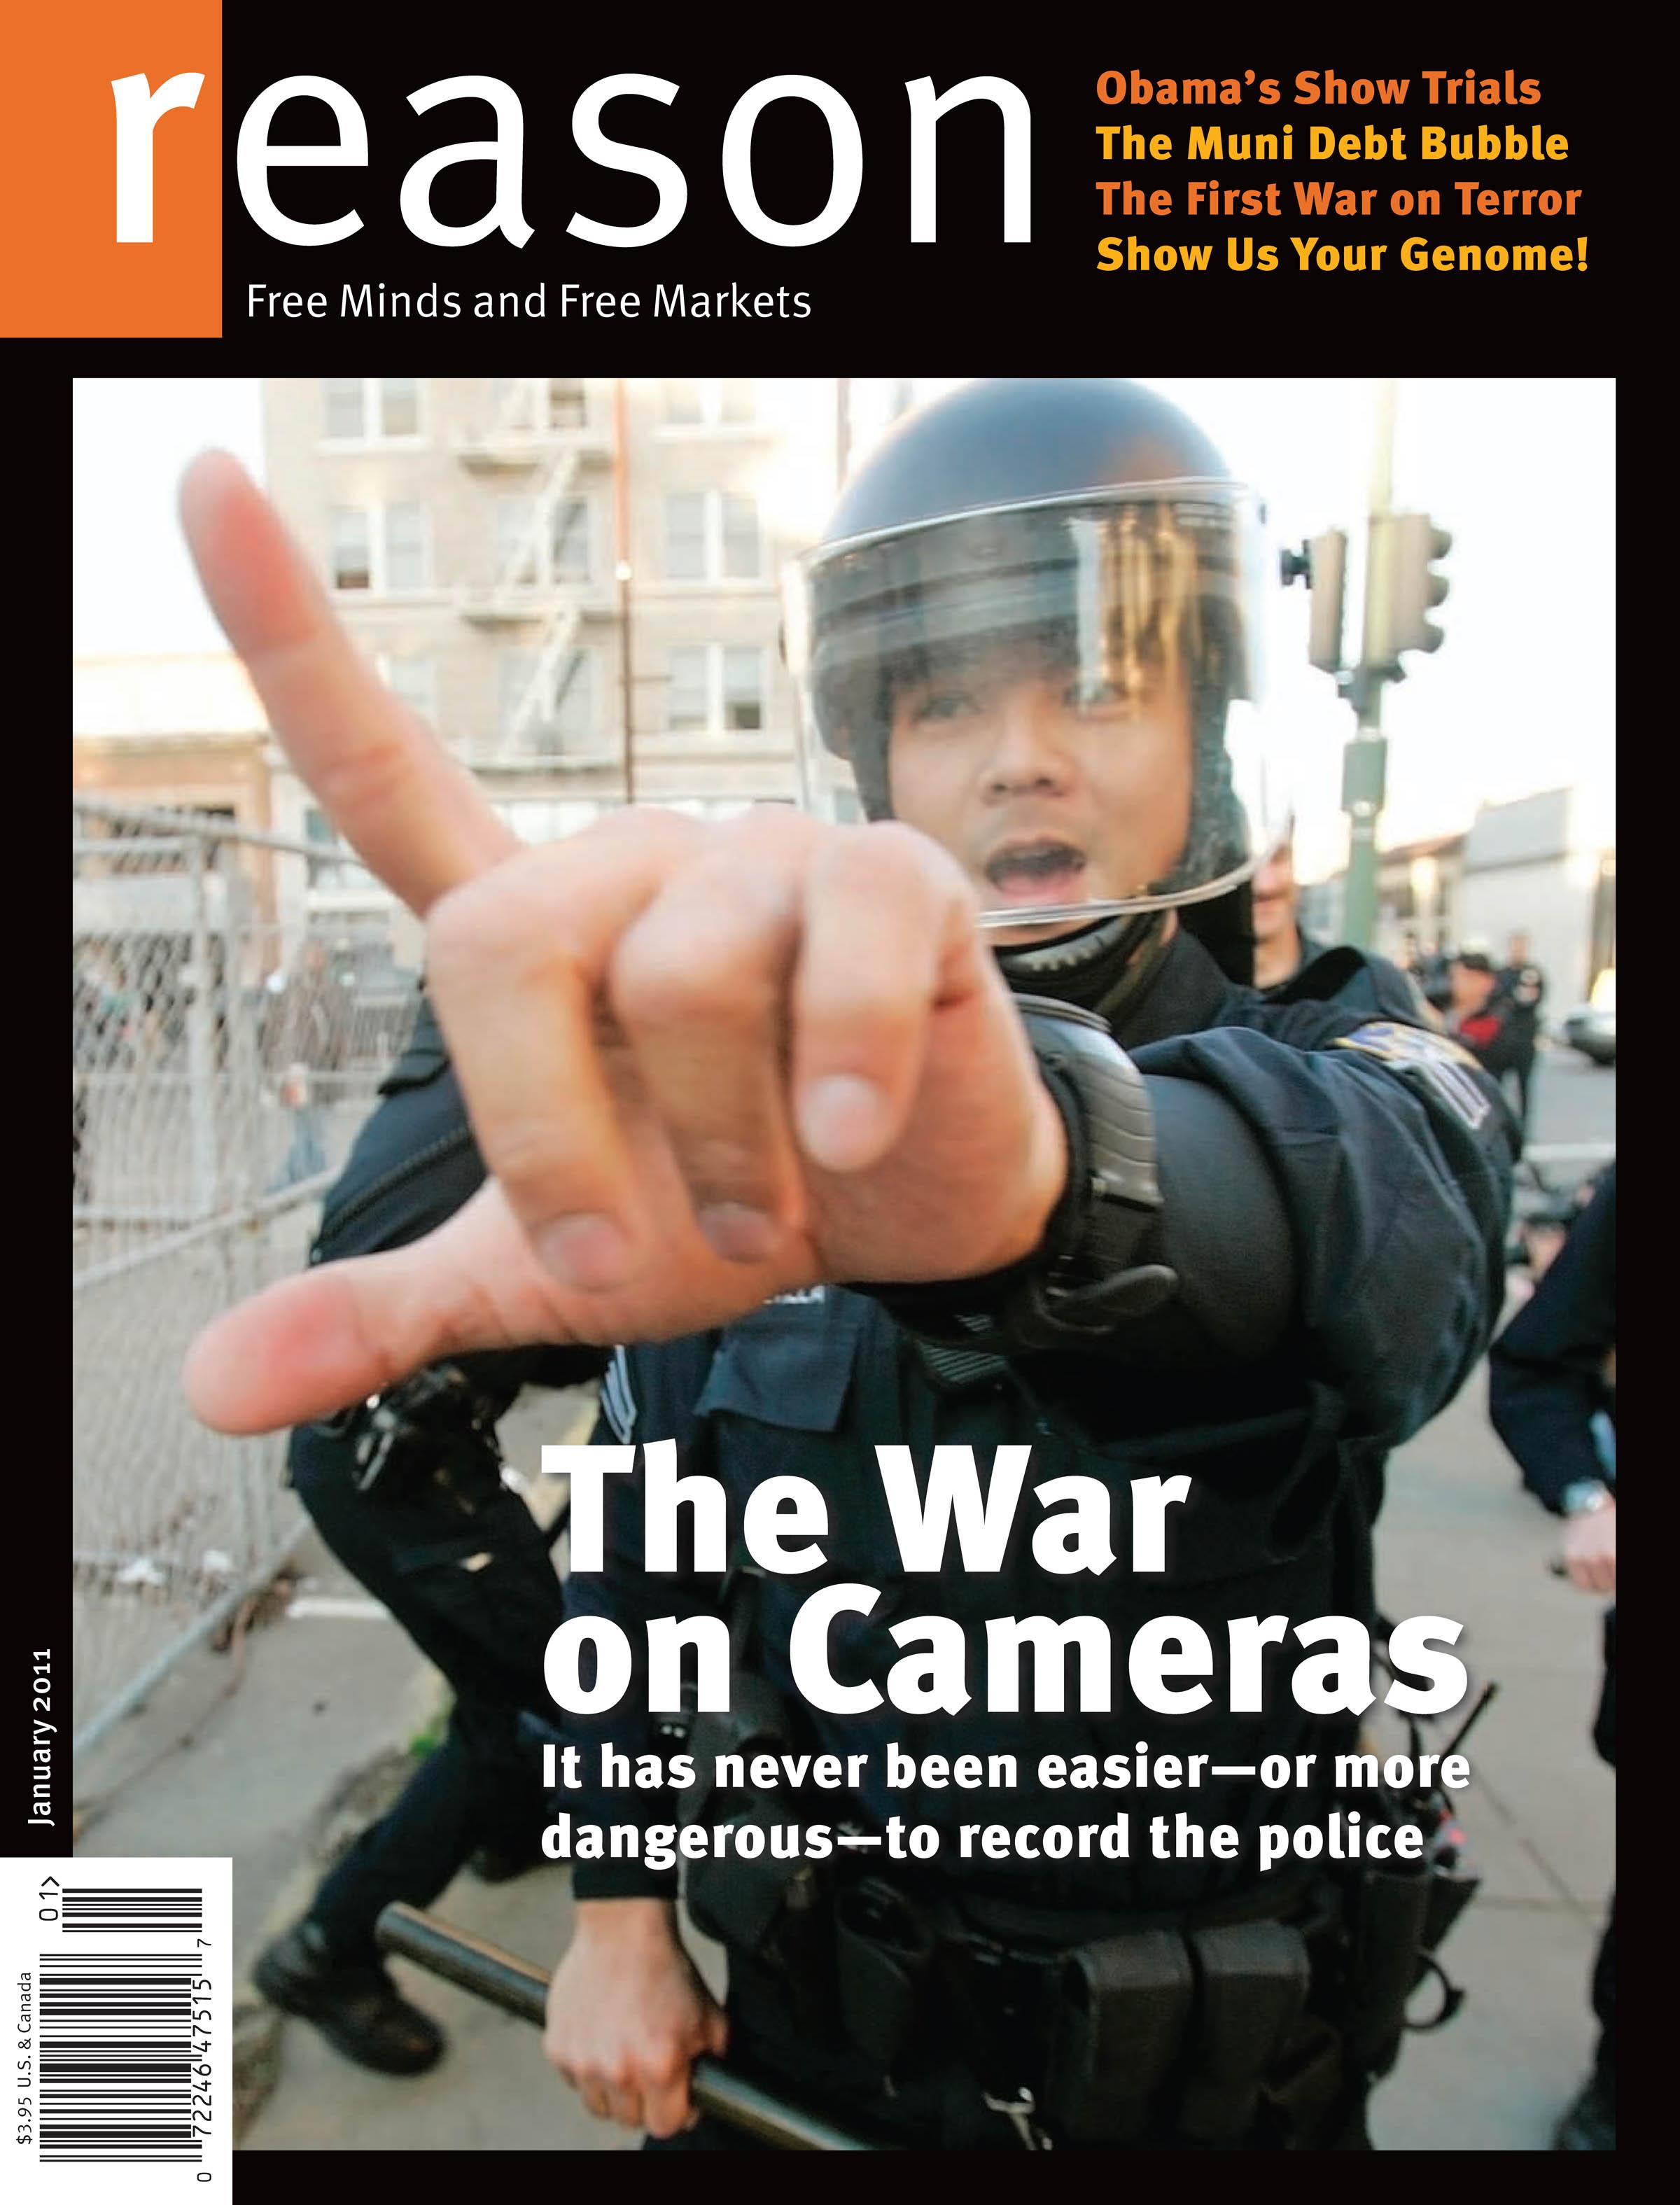 Reason Magazine, January 2011 cover image